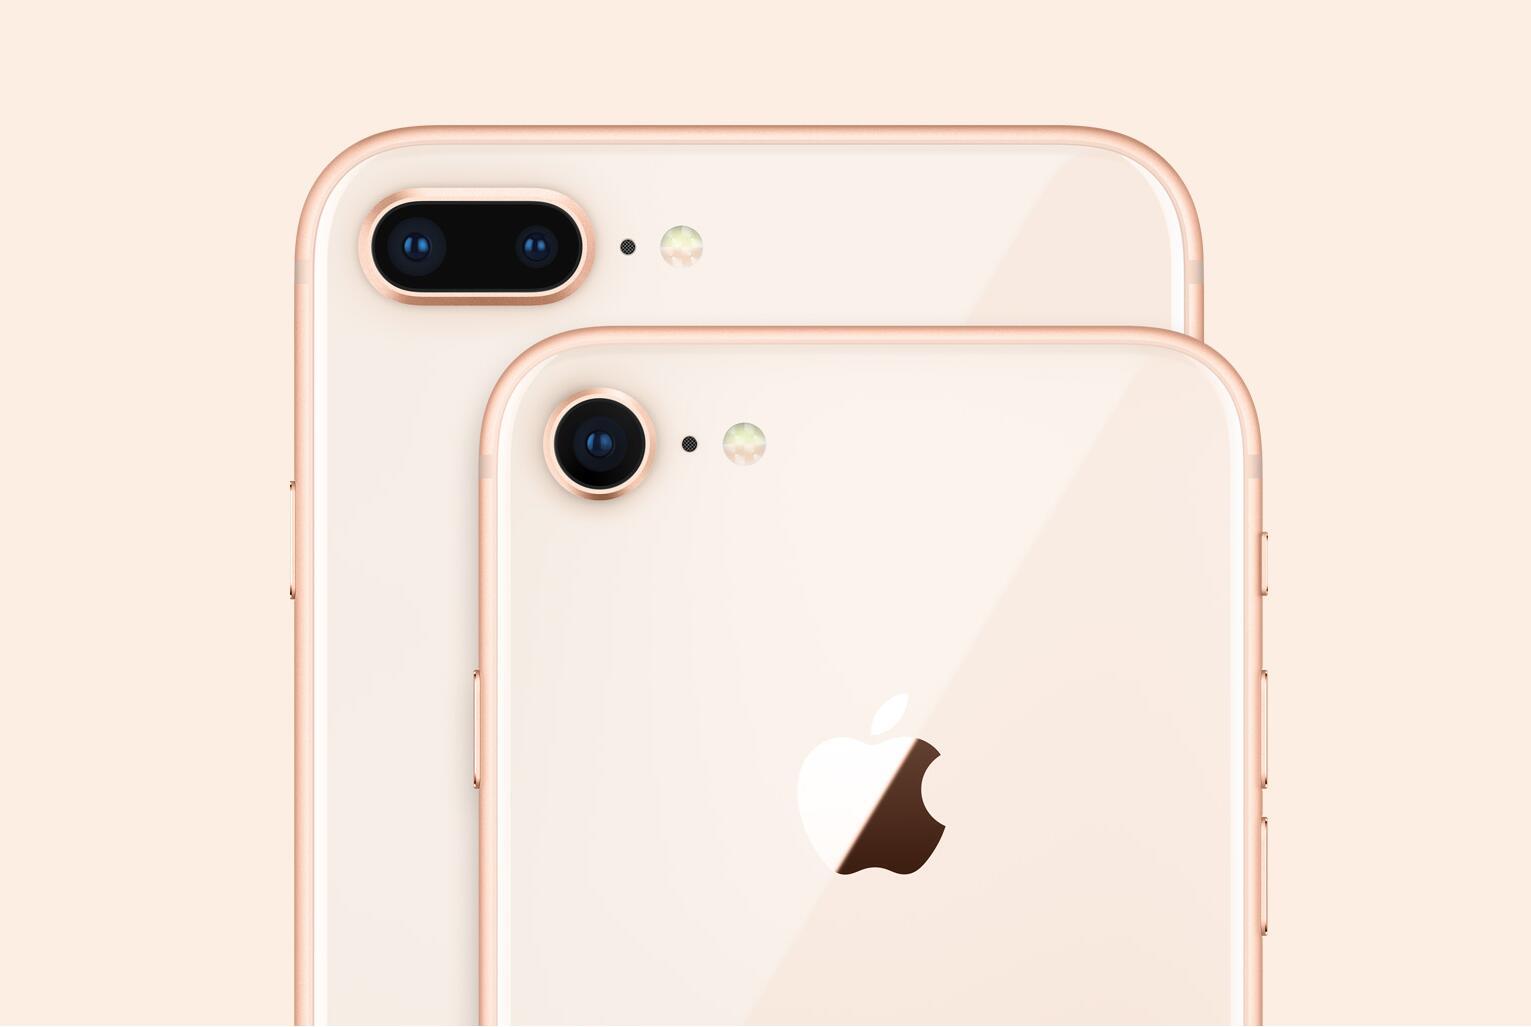 8p和iphone x差不多,且苹果手机的拍照效果在众多手机中仍然占有优势